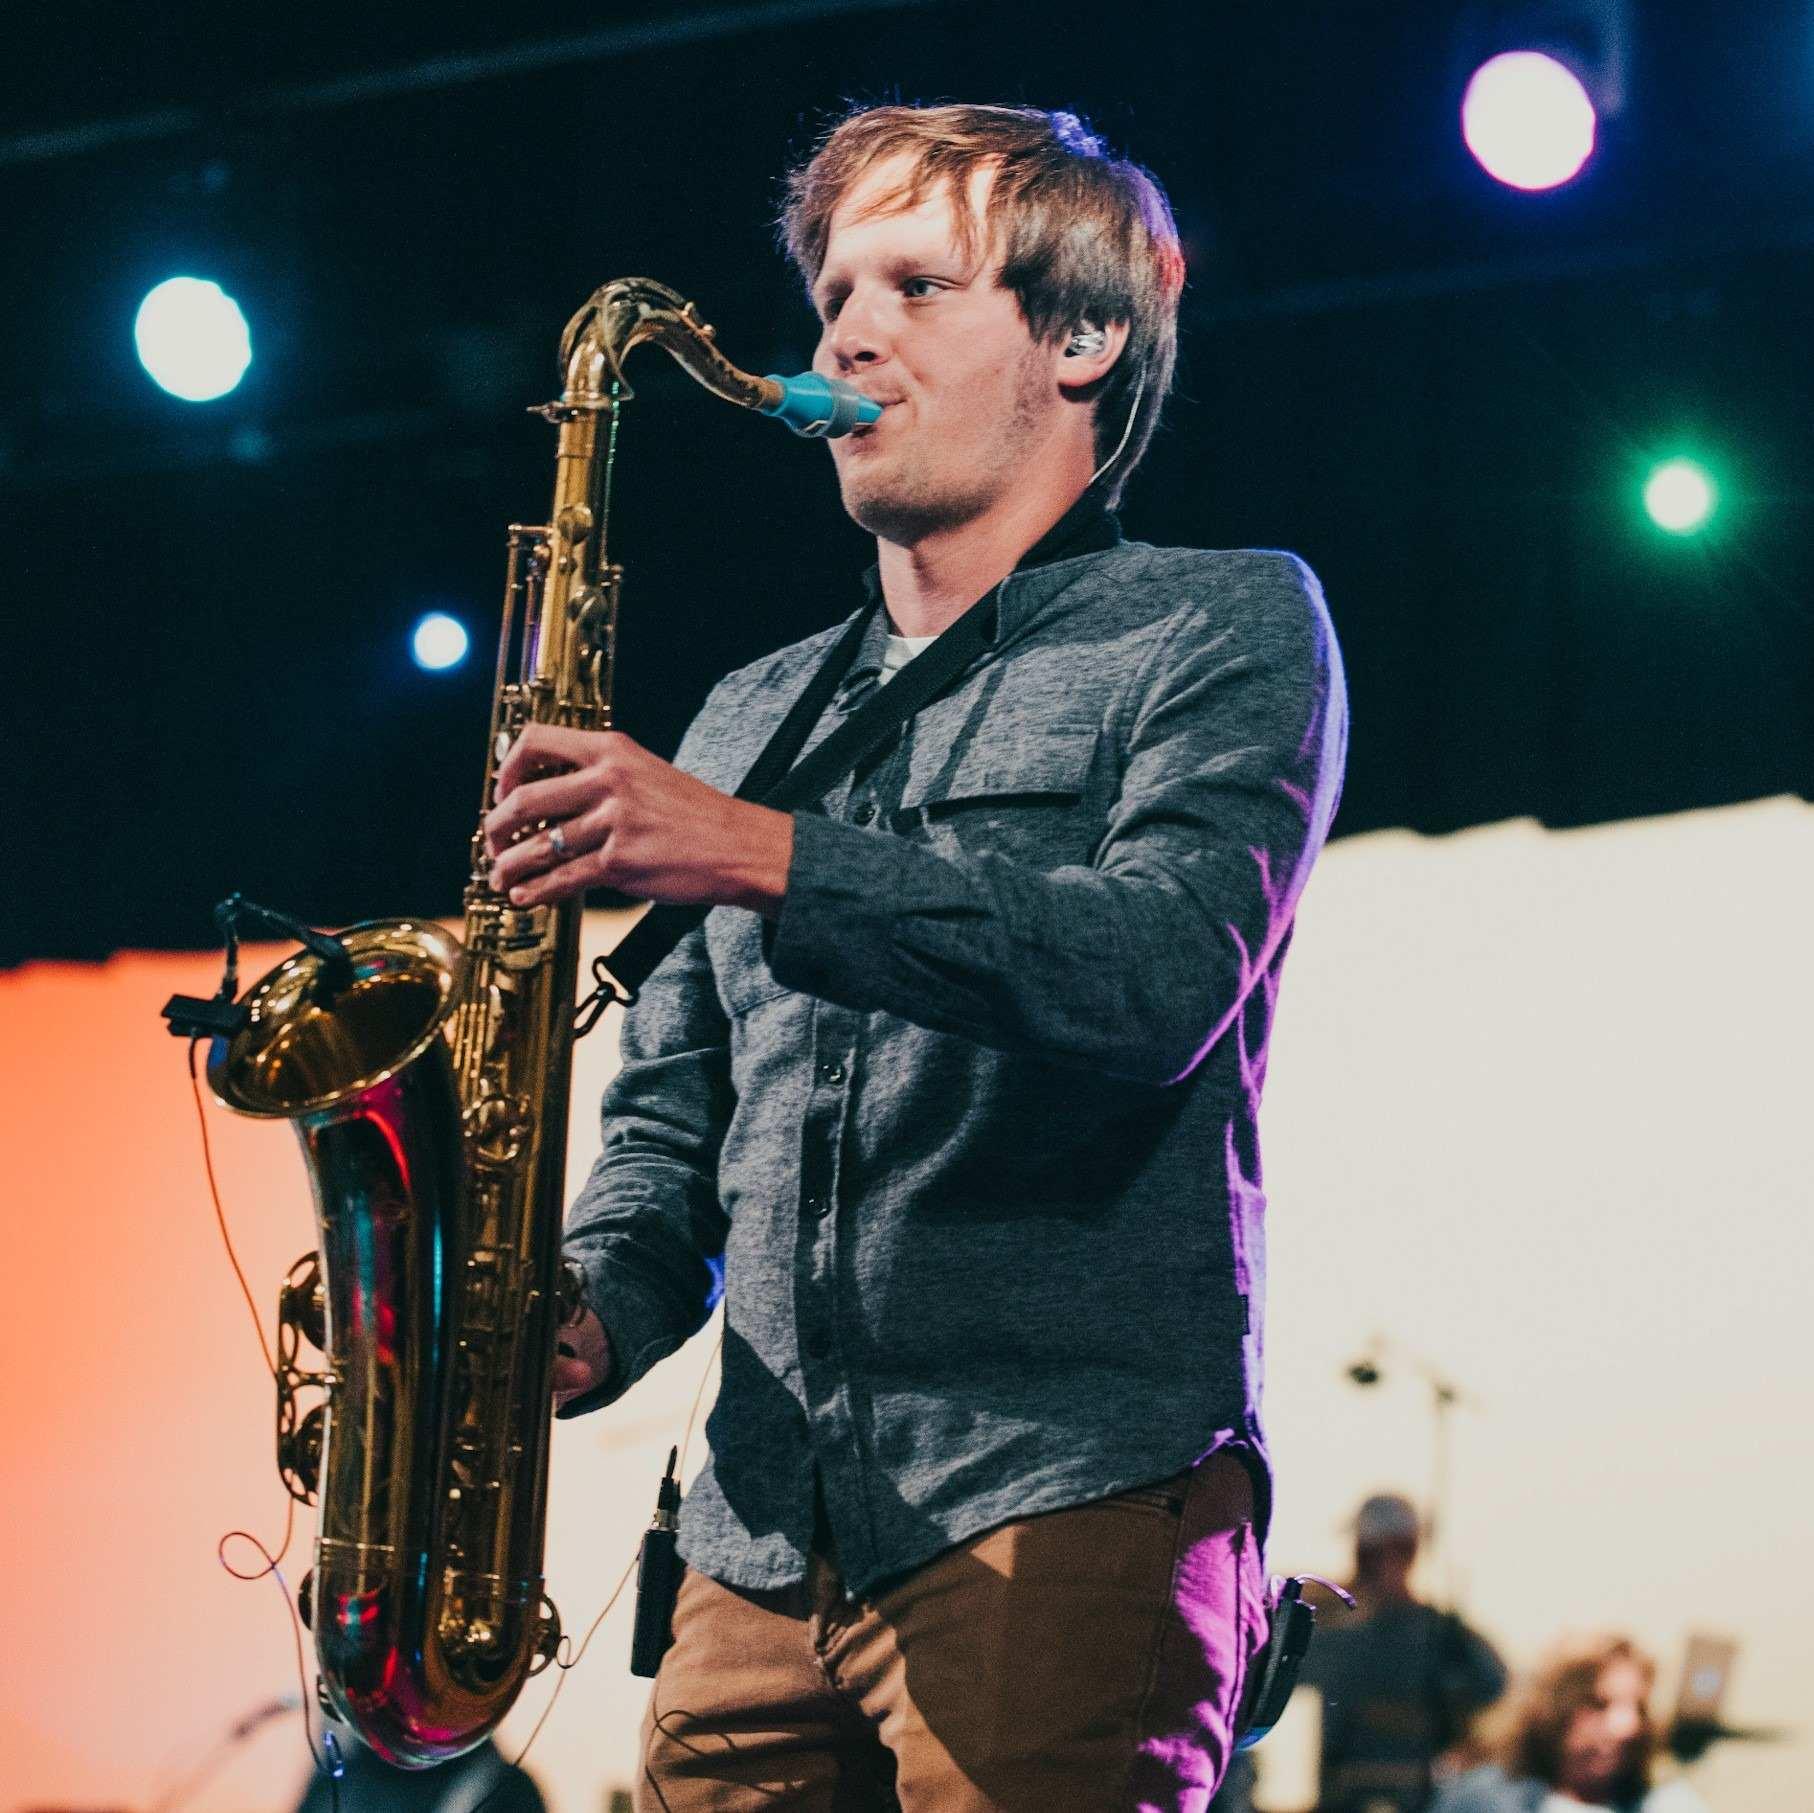 Joe Scheller plays a Syos mouthpiece on tenor saxophone